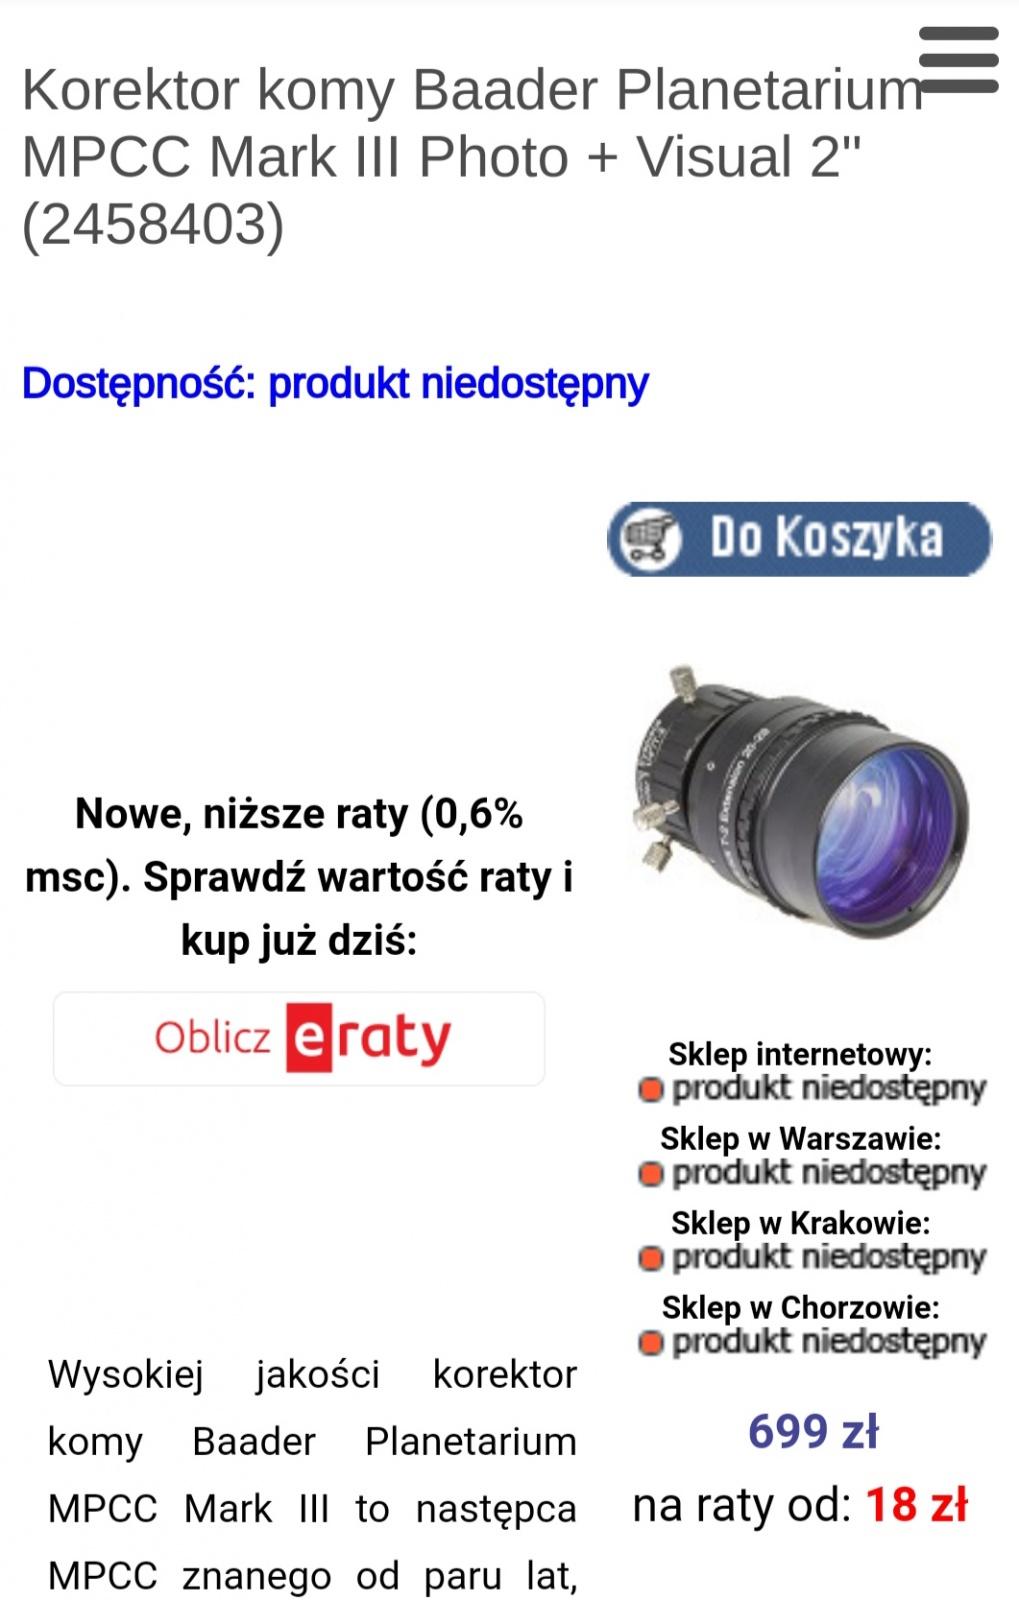 IMG_20210217_134103.jpg